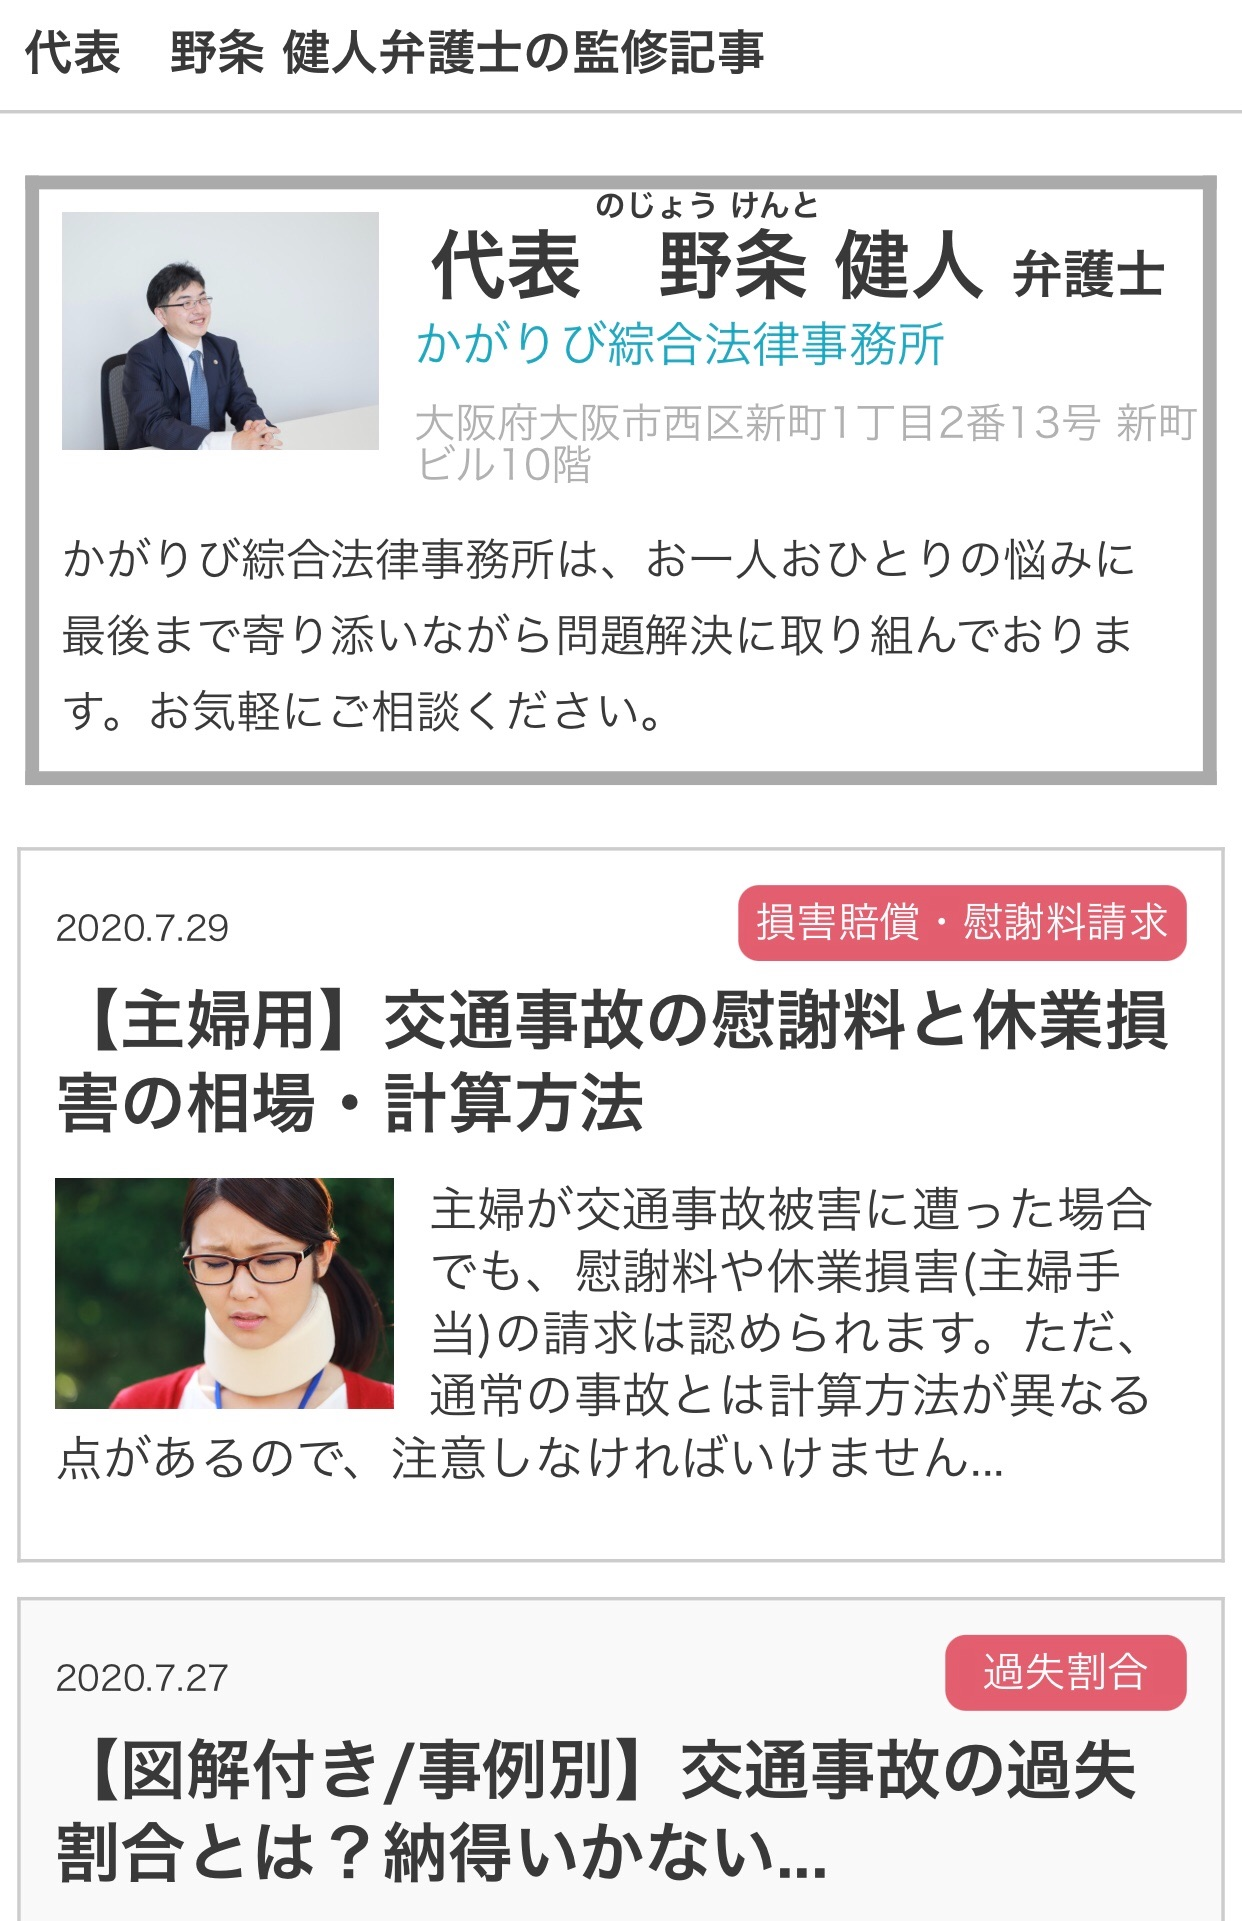 f:id:kagaribi-kotsujiko:20210121234604j:image